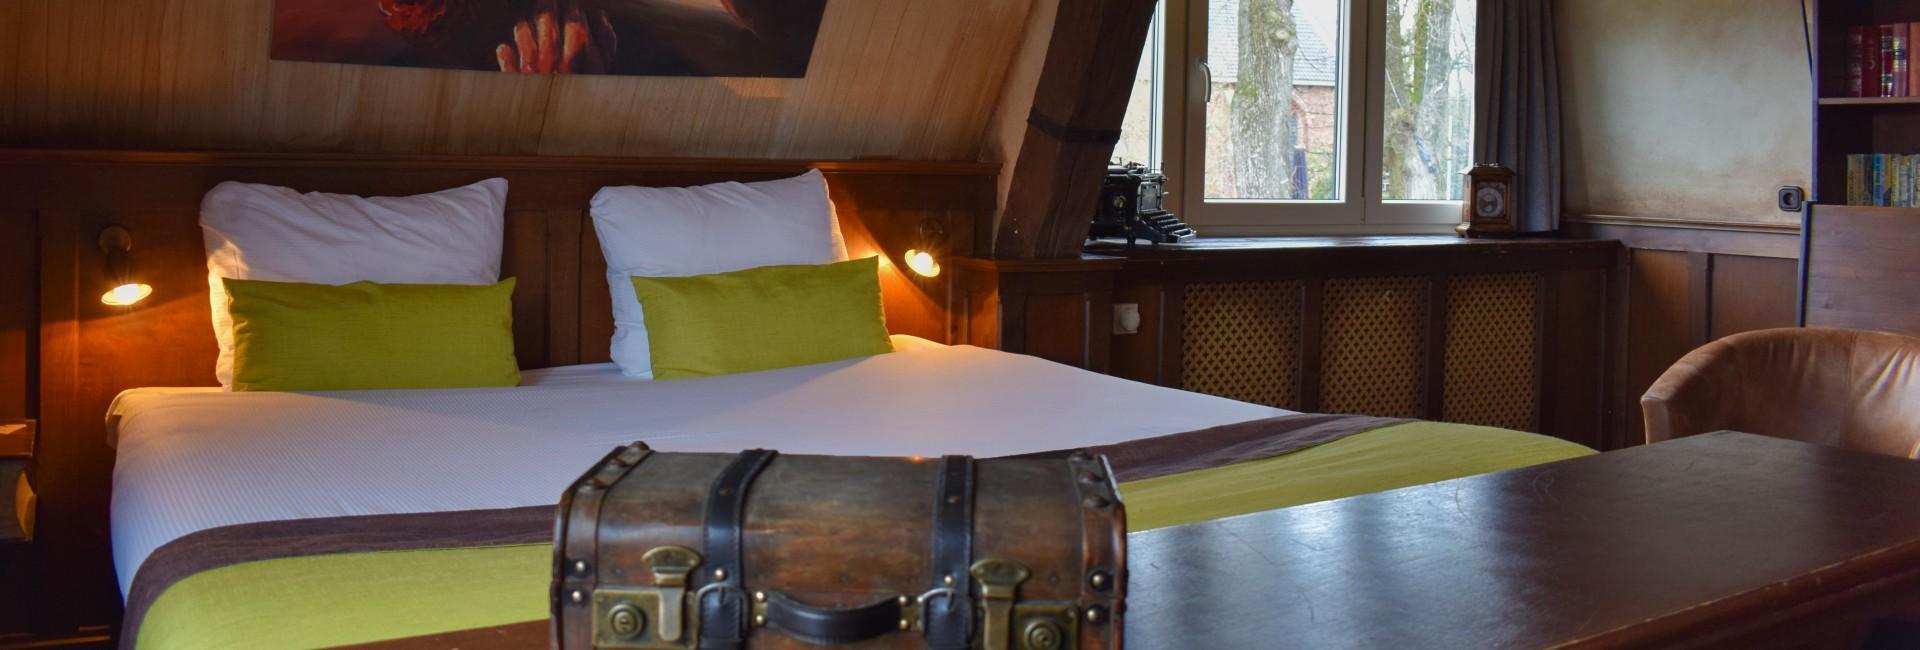 Hotel | Restaurant | Wellness | Lounge | Terrace | Meetings | Celebrations